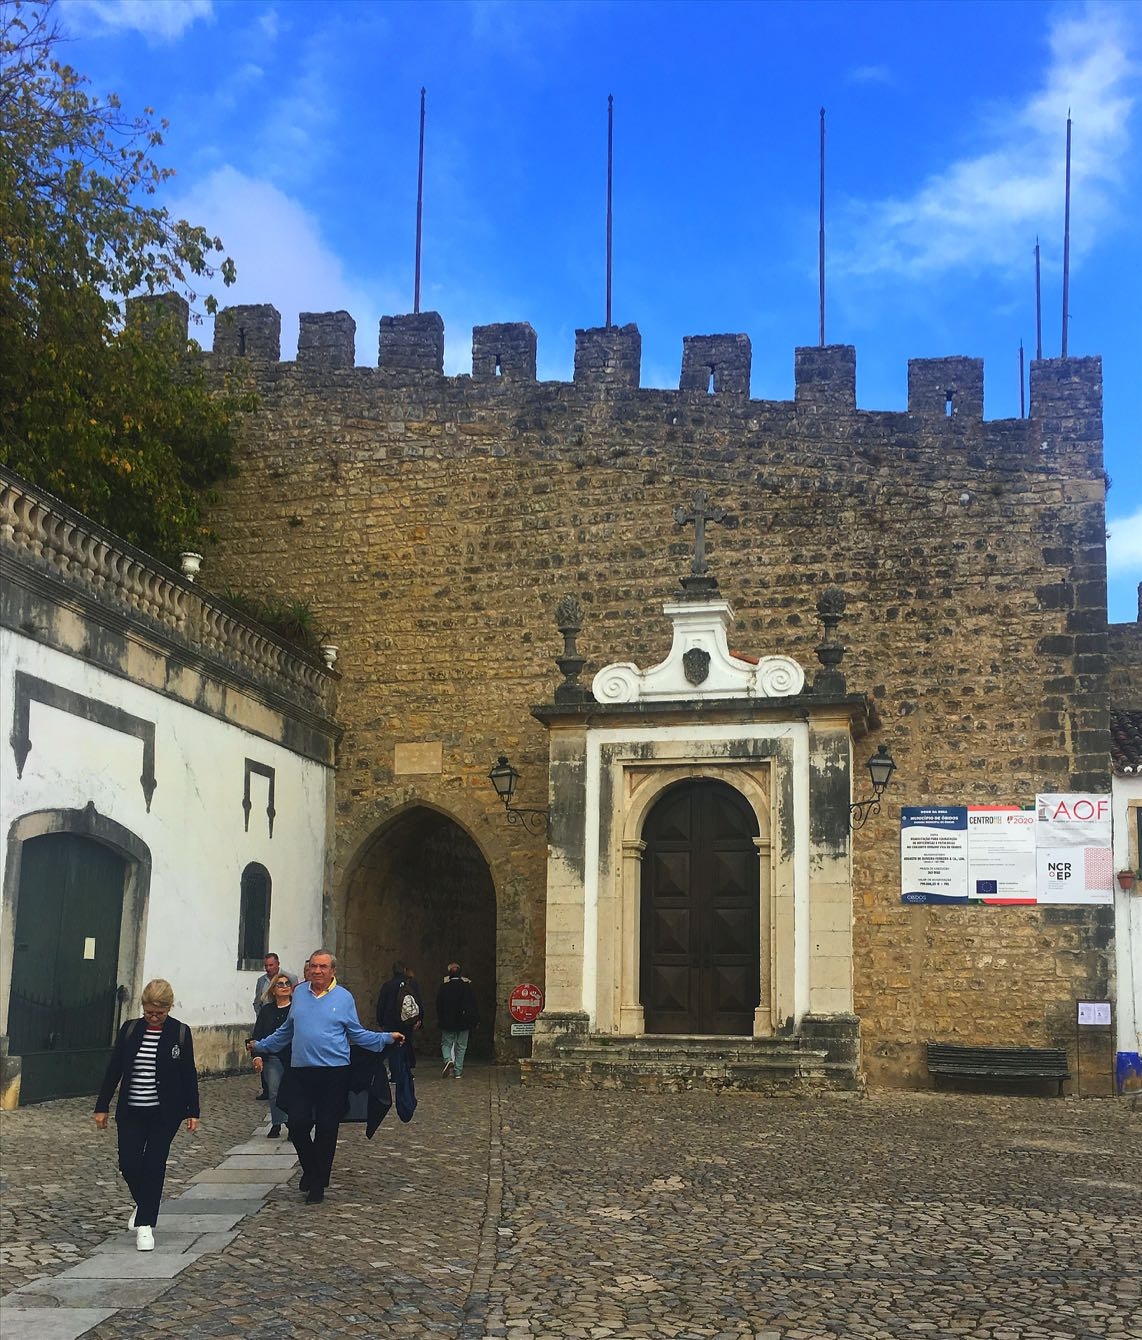 Porta de vila-Obidos